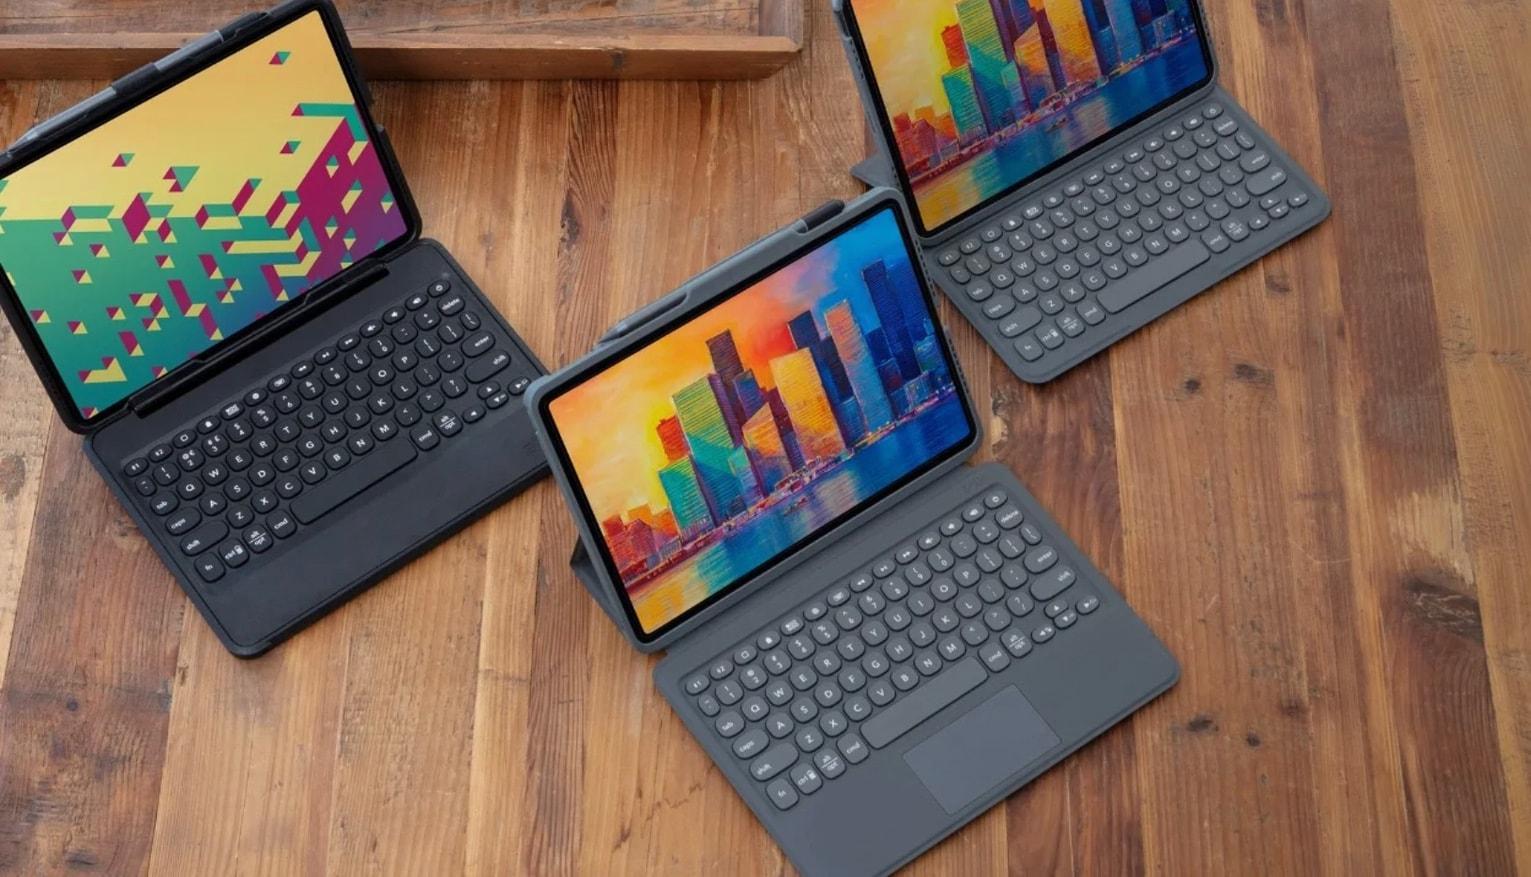 Zagg Pro Keys and Rugged Book iPad keyboard cases